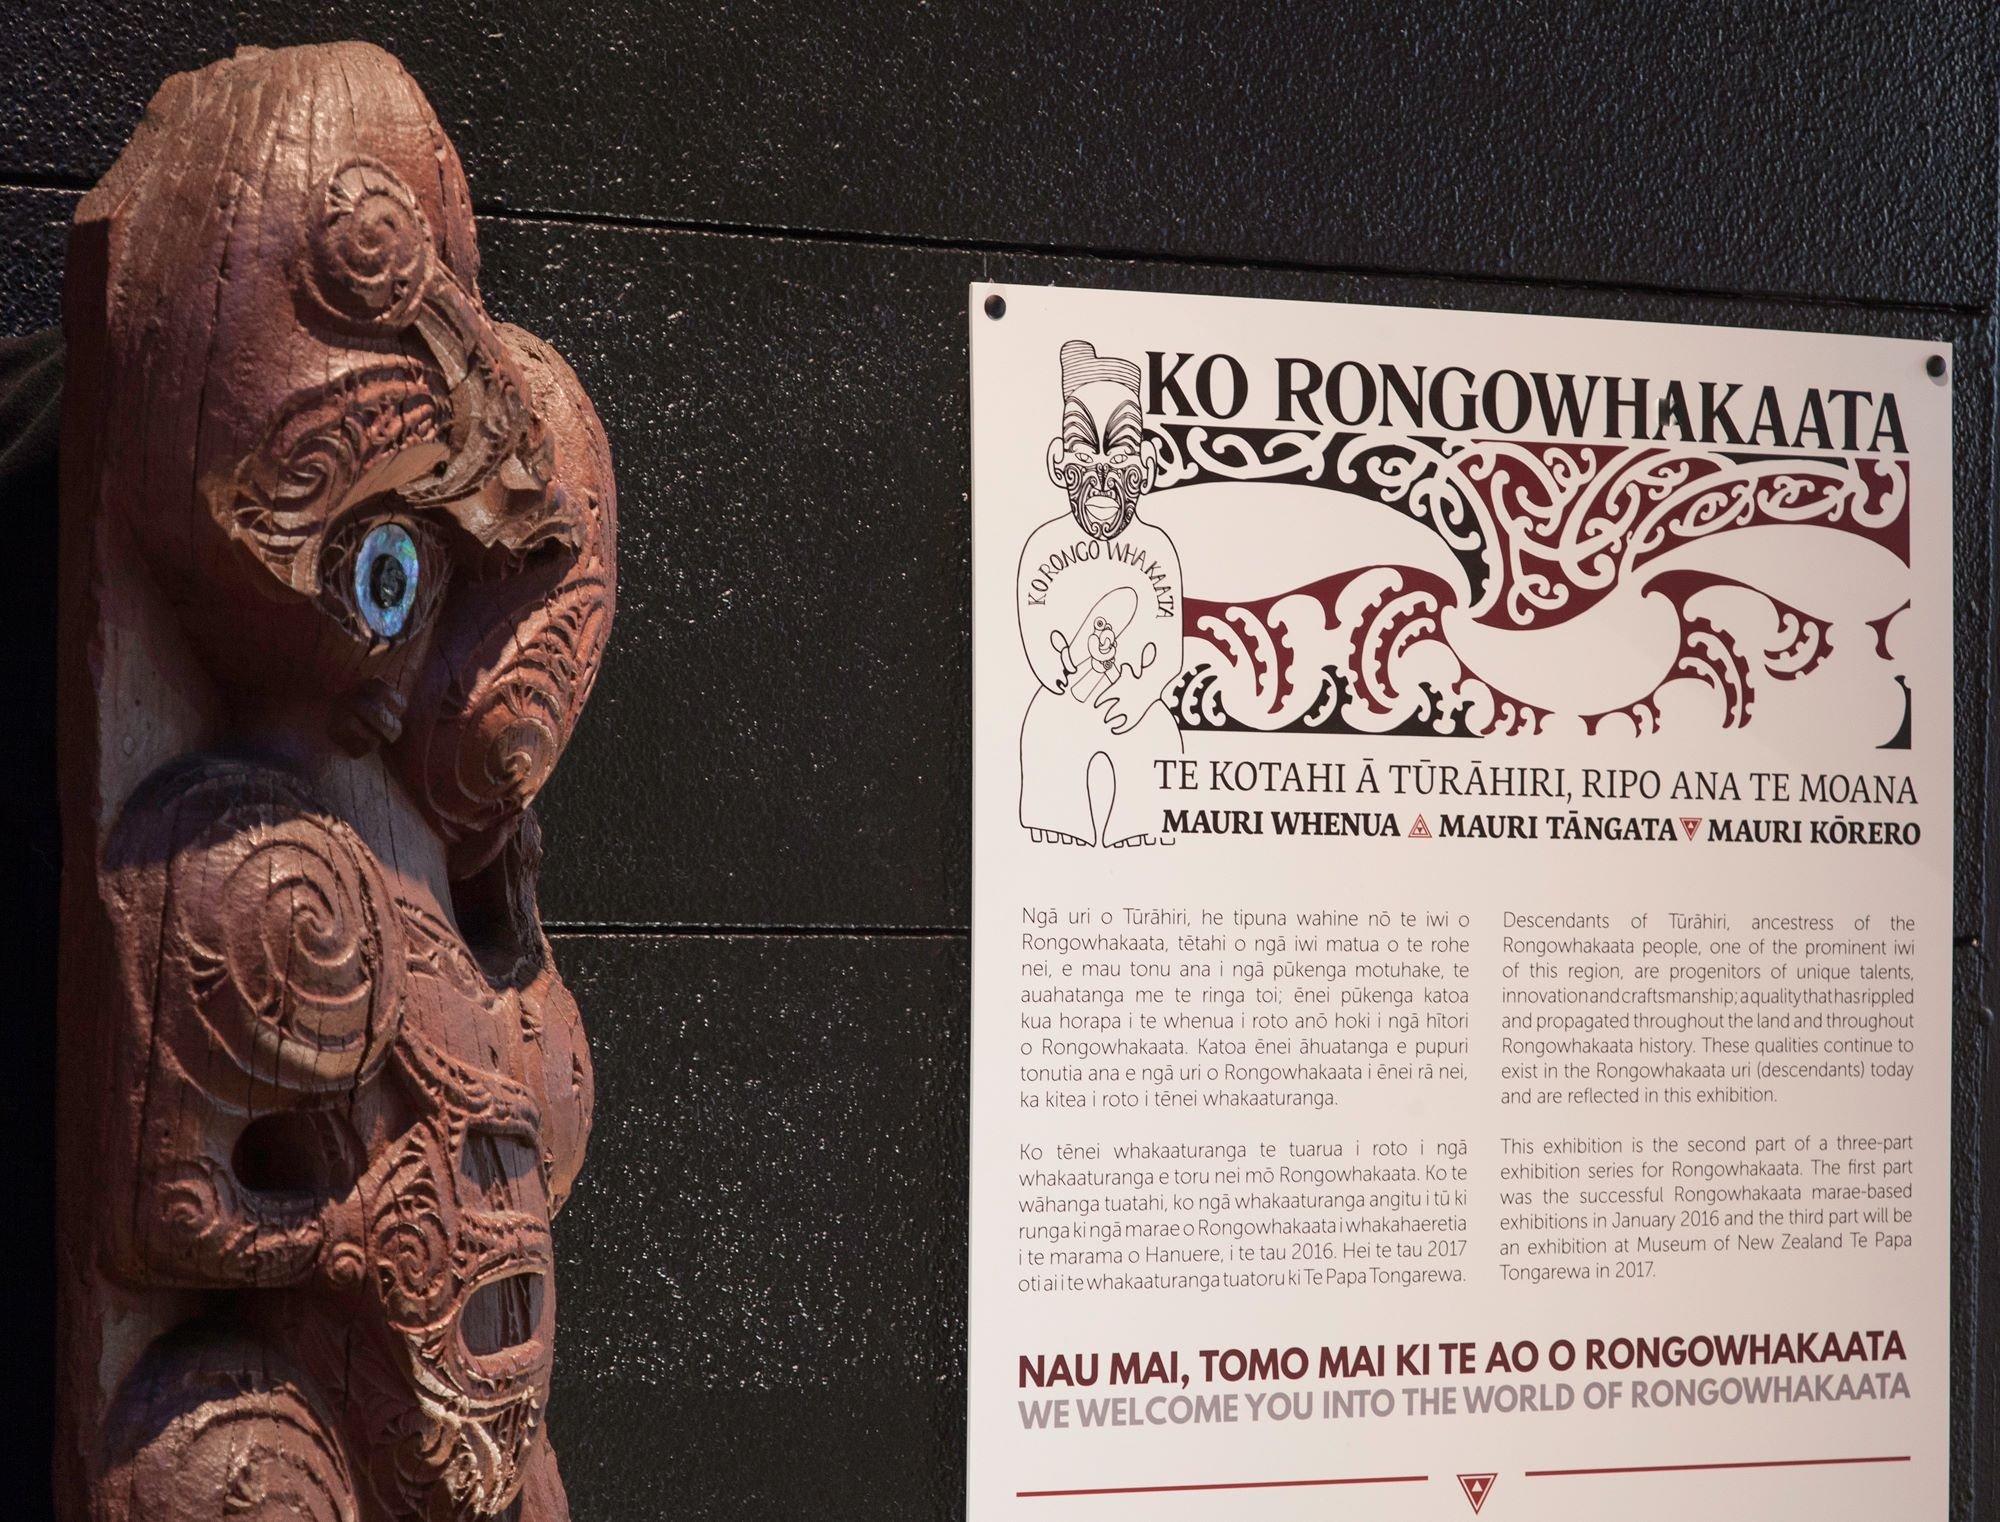 Ko Rongowhakaata exhibition, 2016